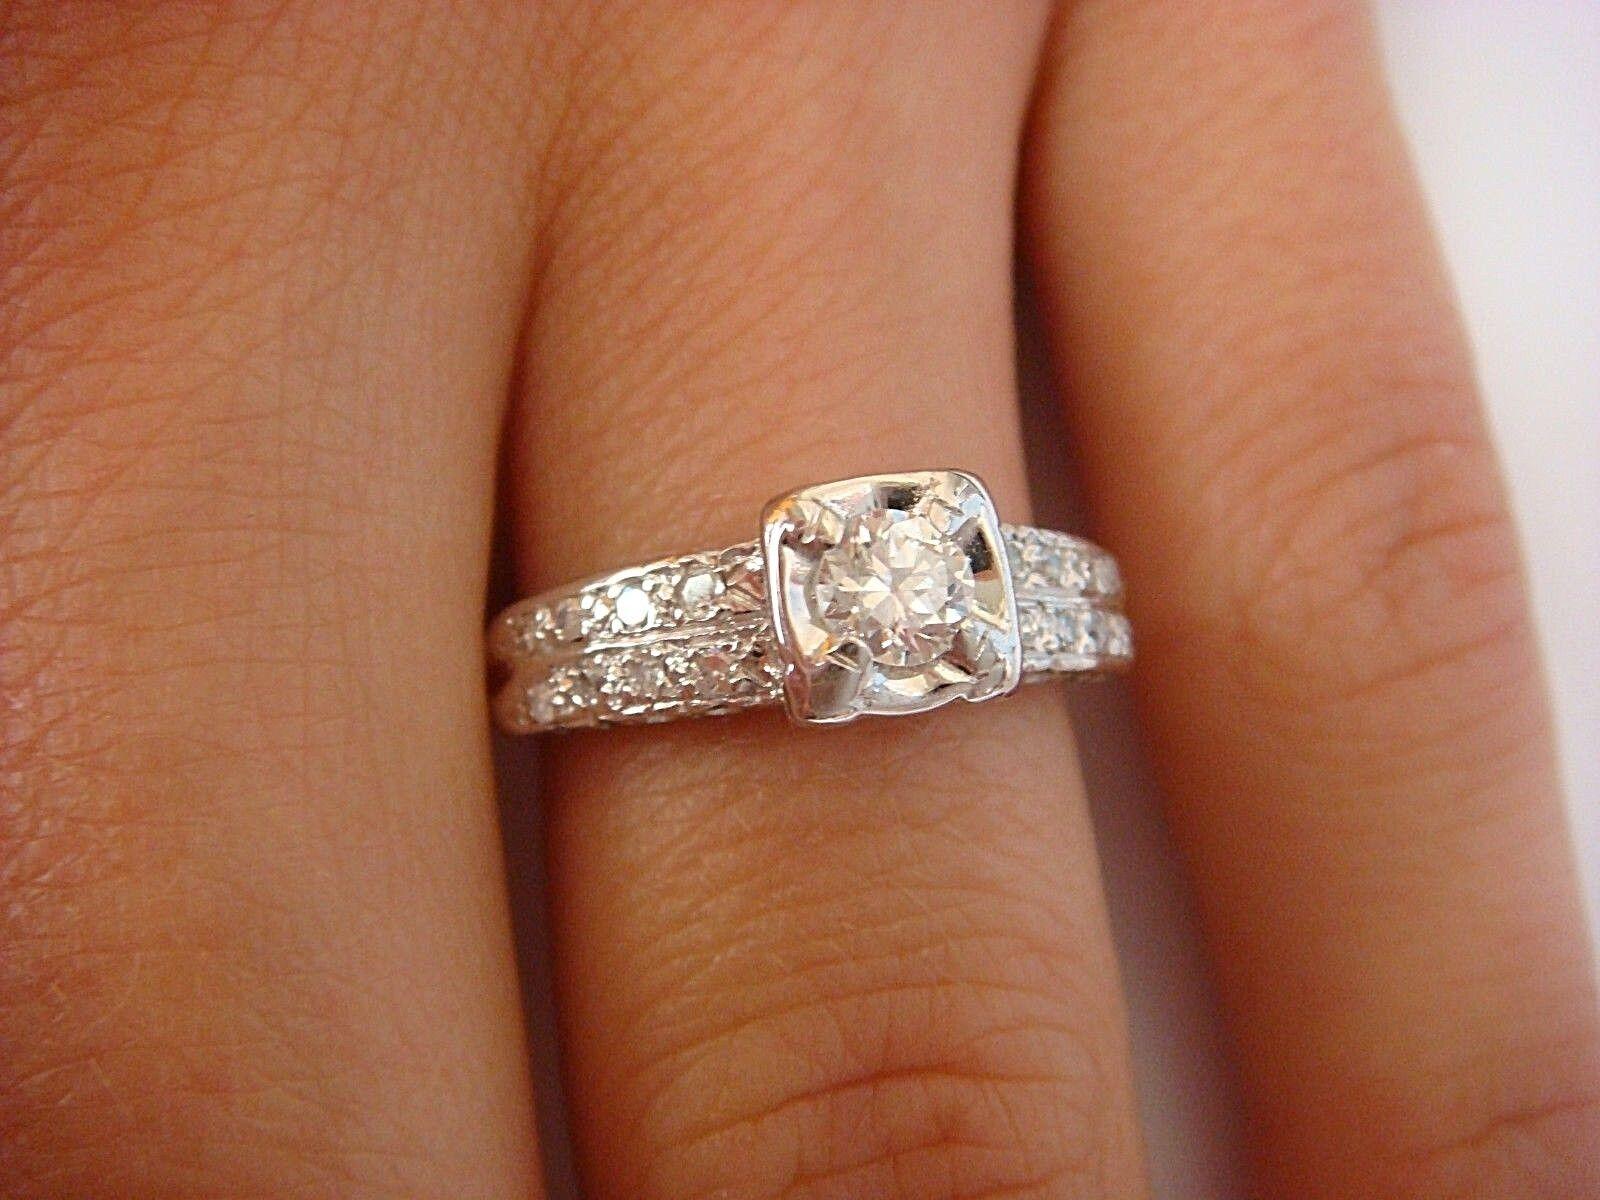 14k White Gold Engagement Wedding Semi Mount Diamond Ring Heart Shape 8.5x8.5mm Lustrous Engagement & Wedding